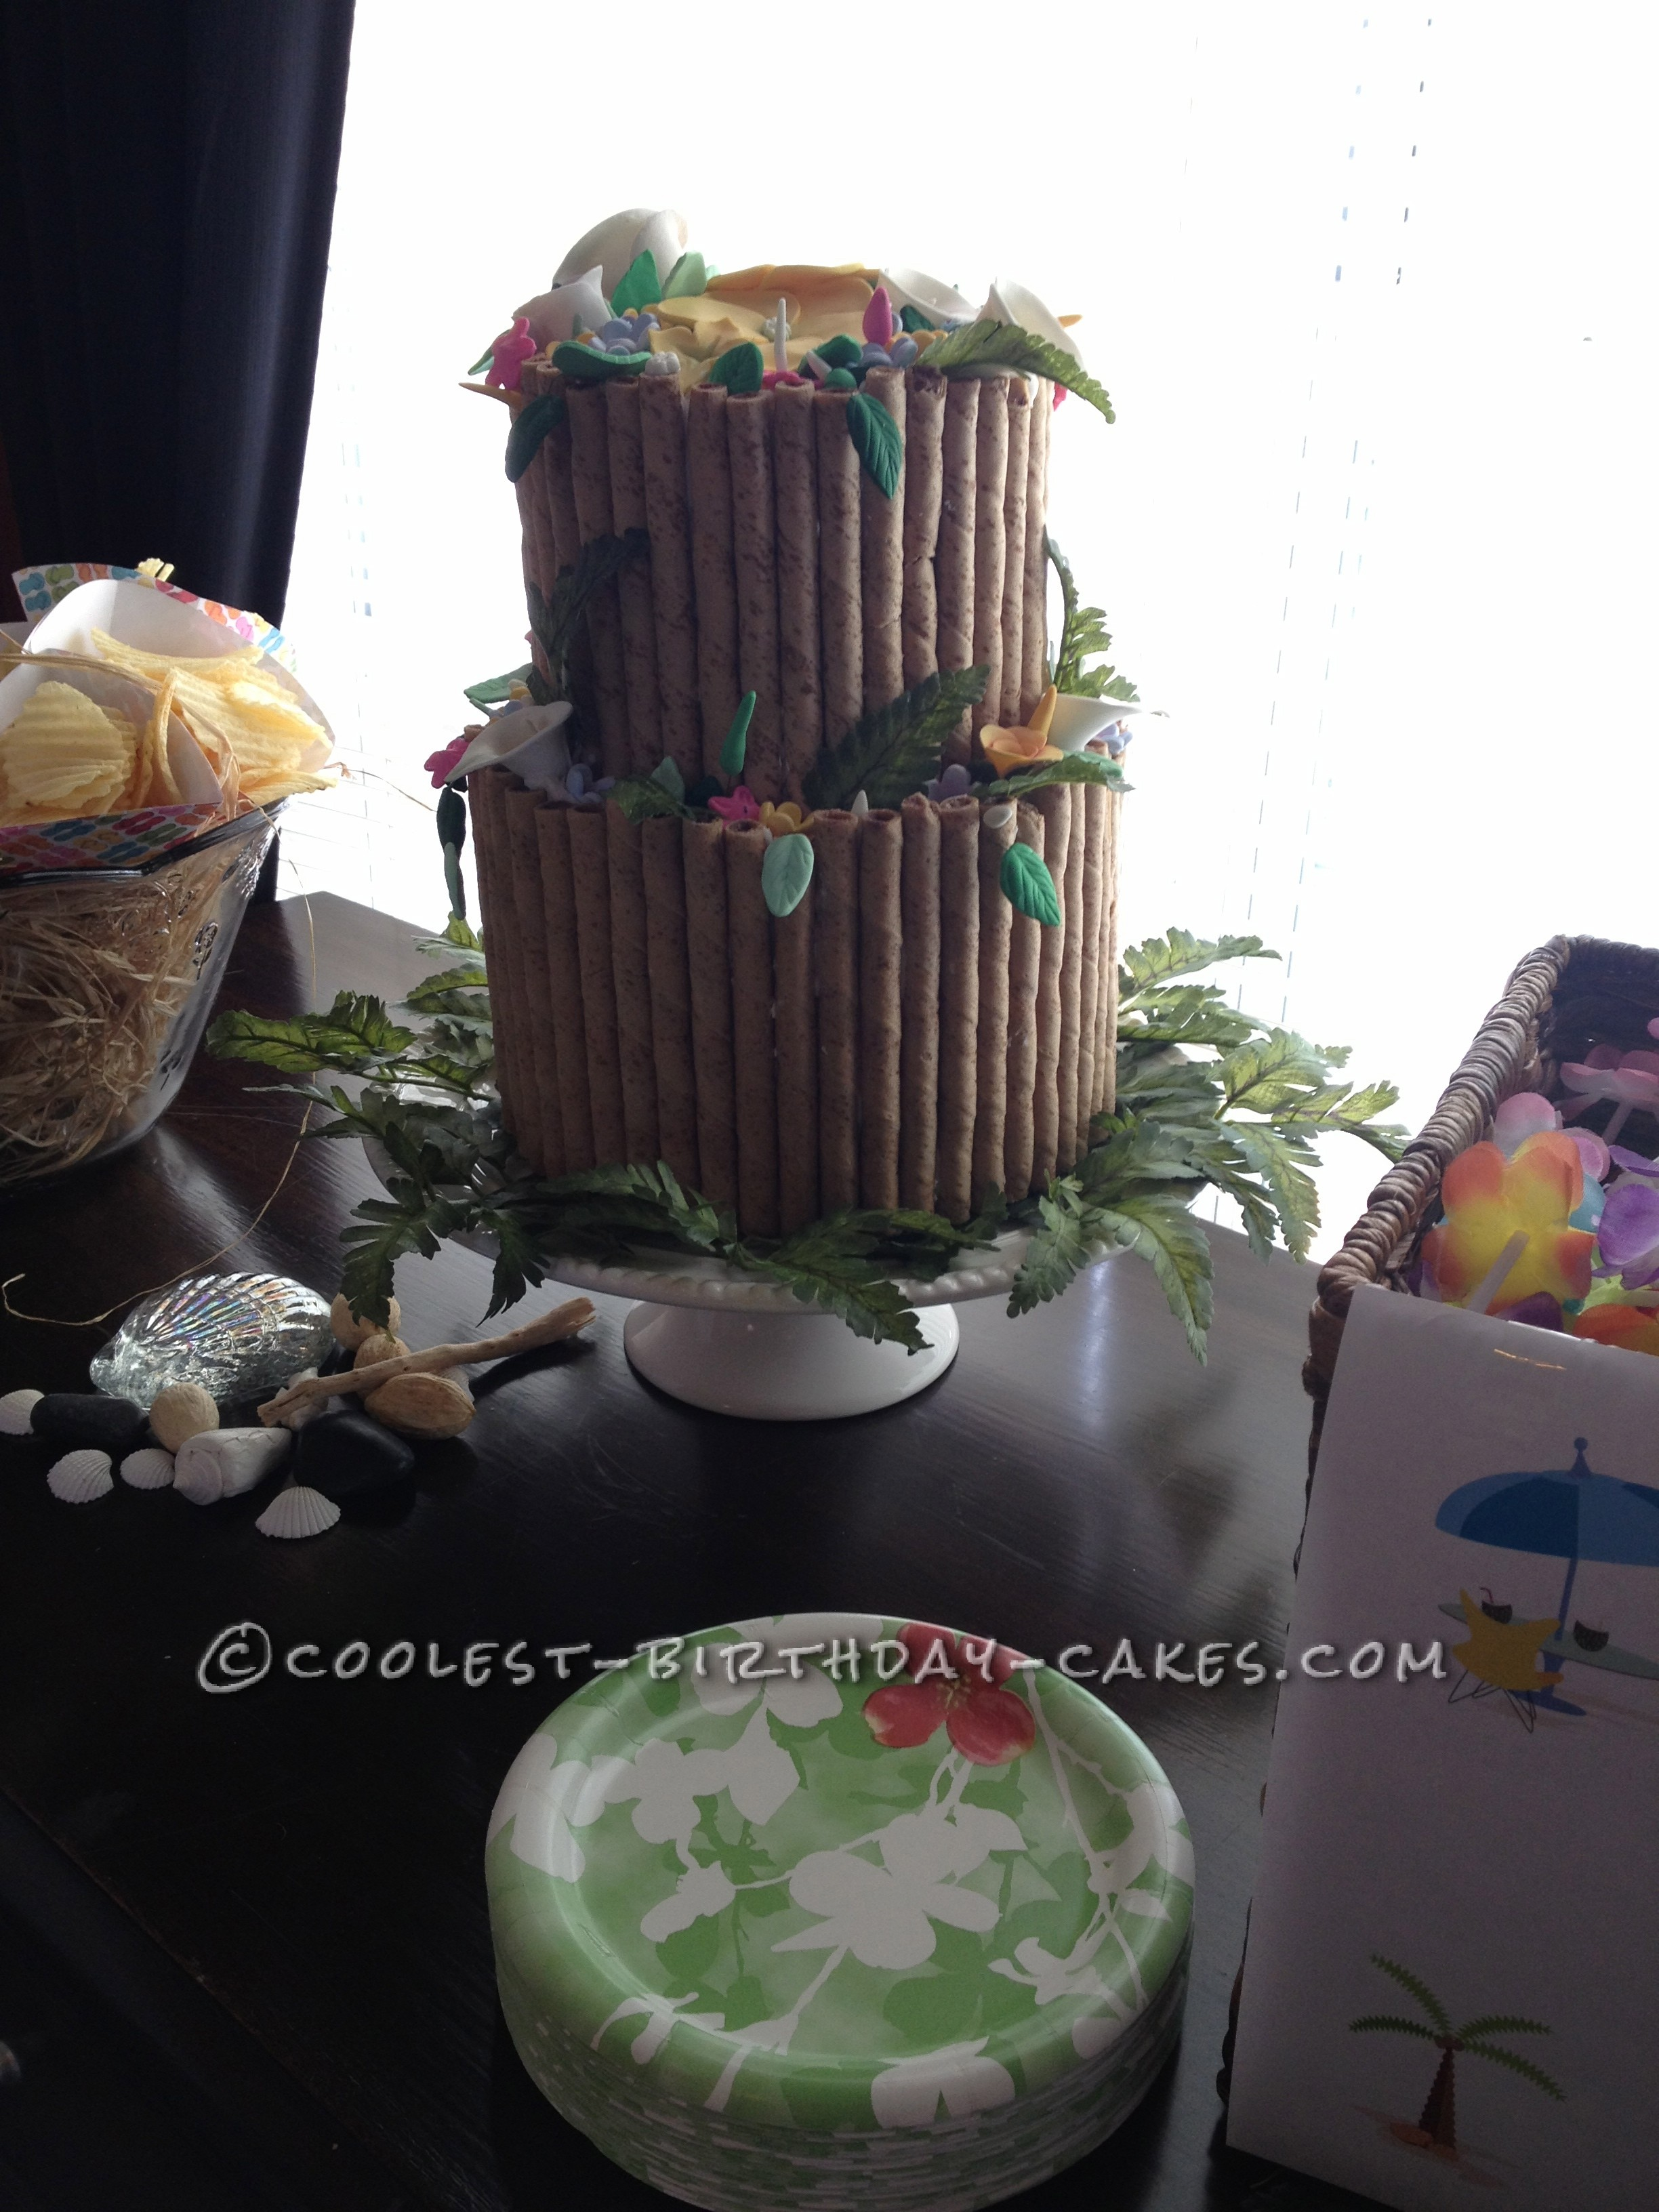 Coolest Luau Birthday Cake